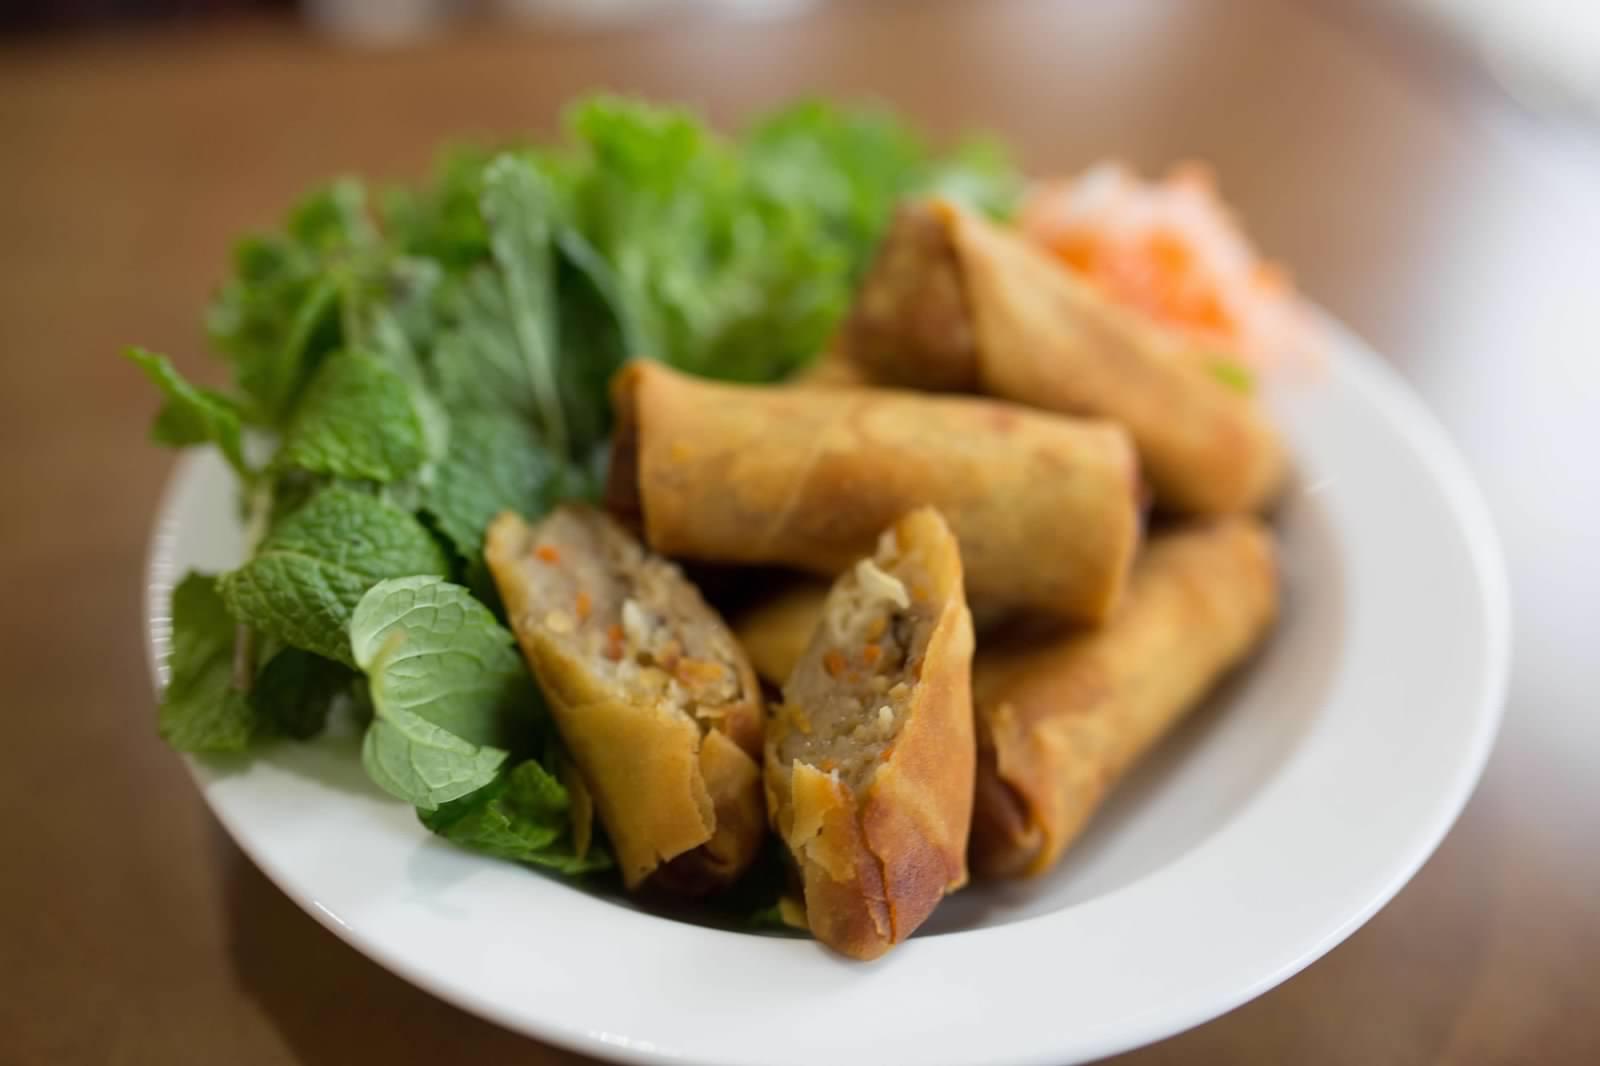 V1. Chả Giò (Vietnamese Shrimp & Pork Eggrolls) (6) Image